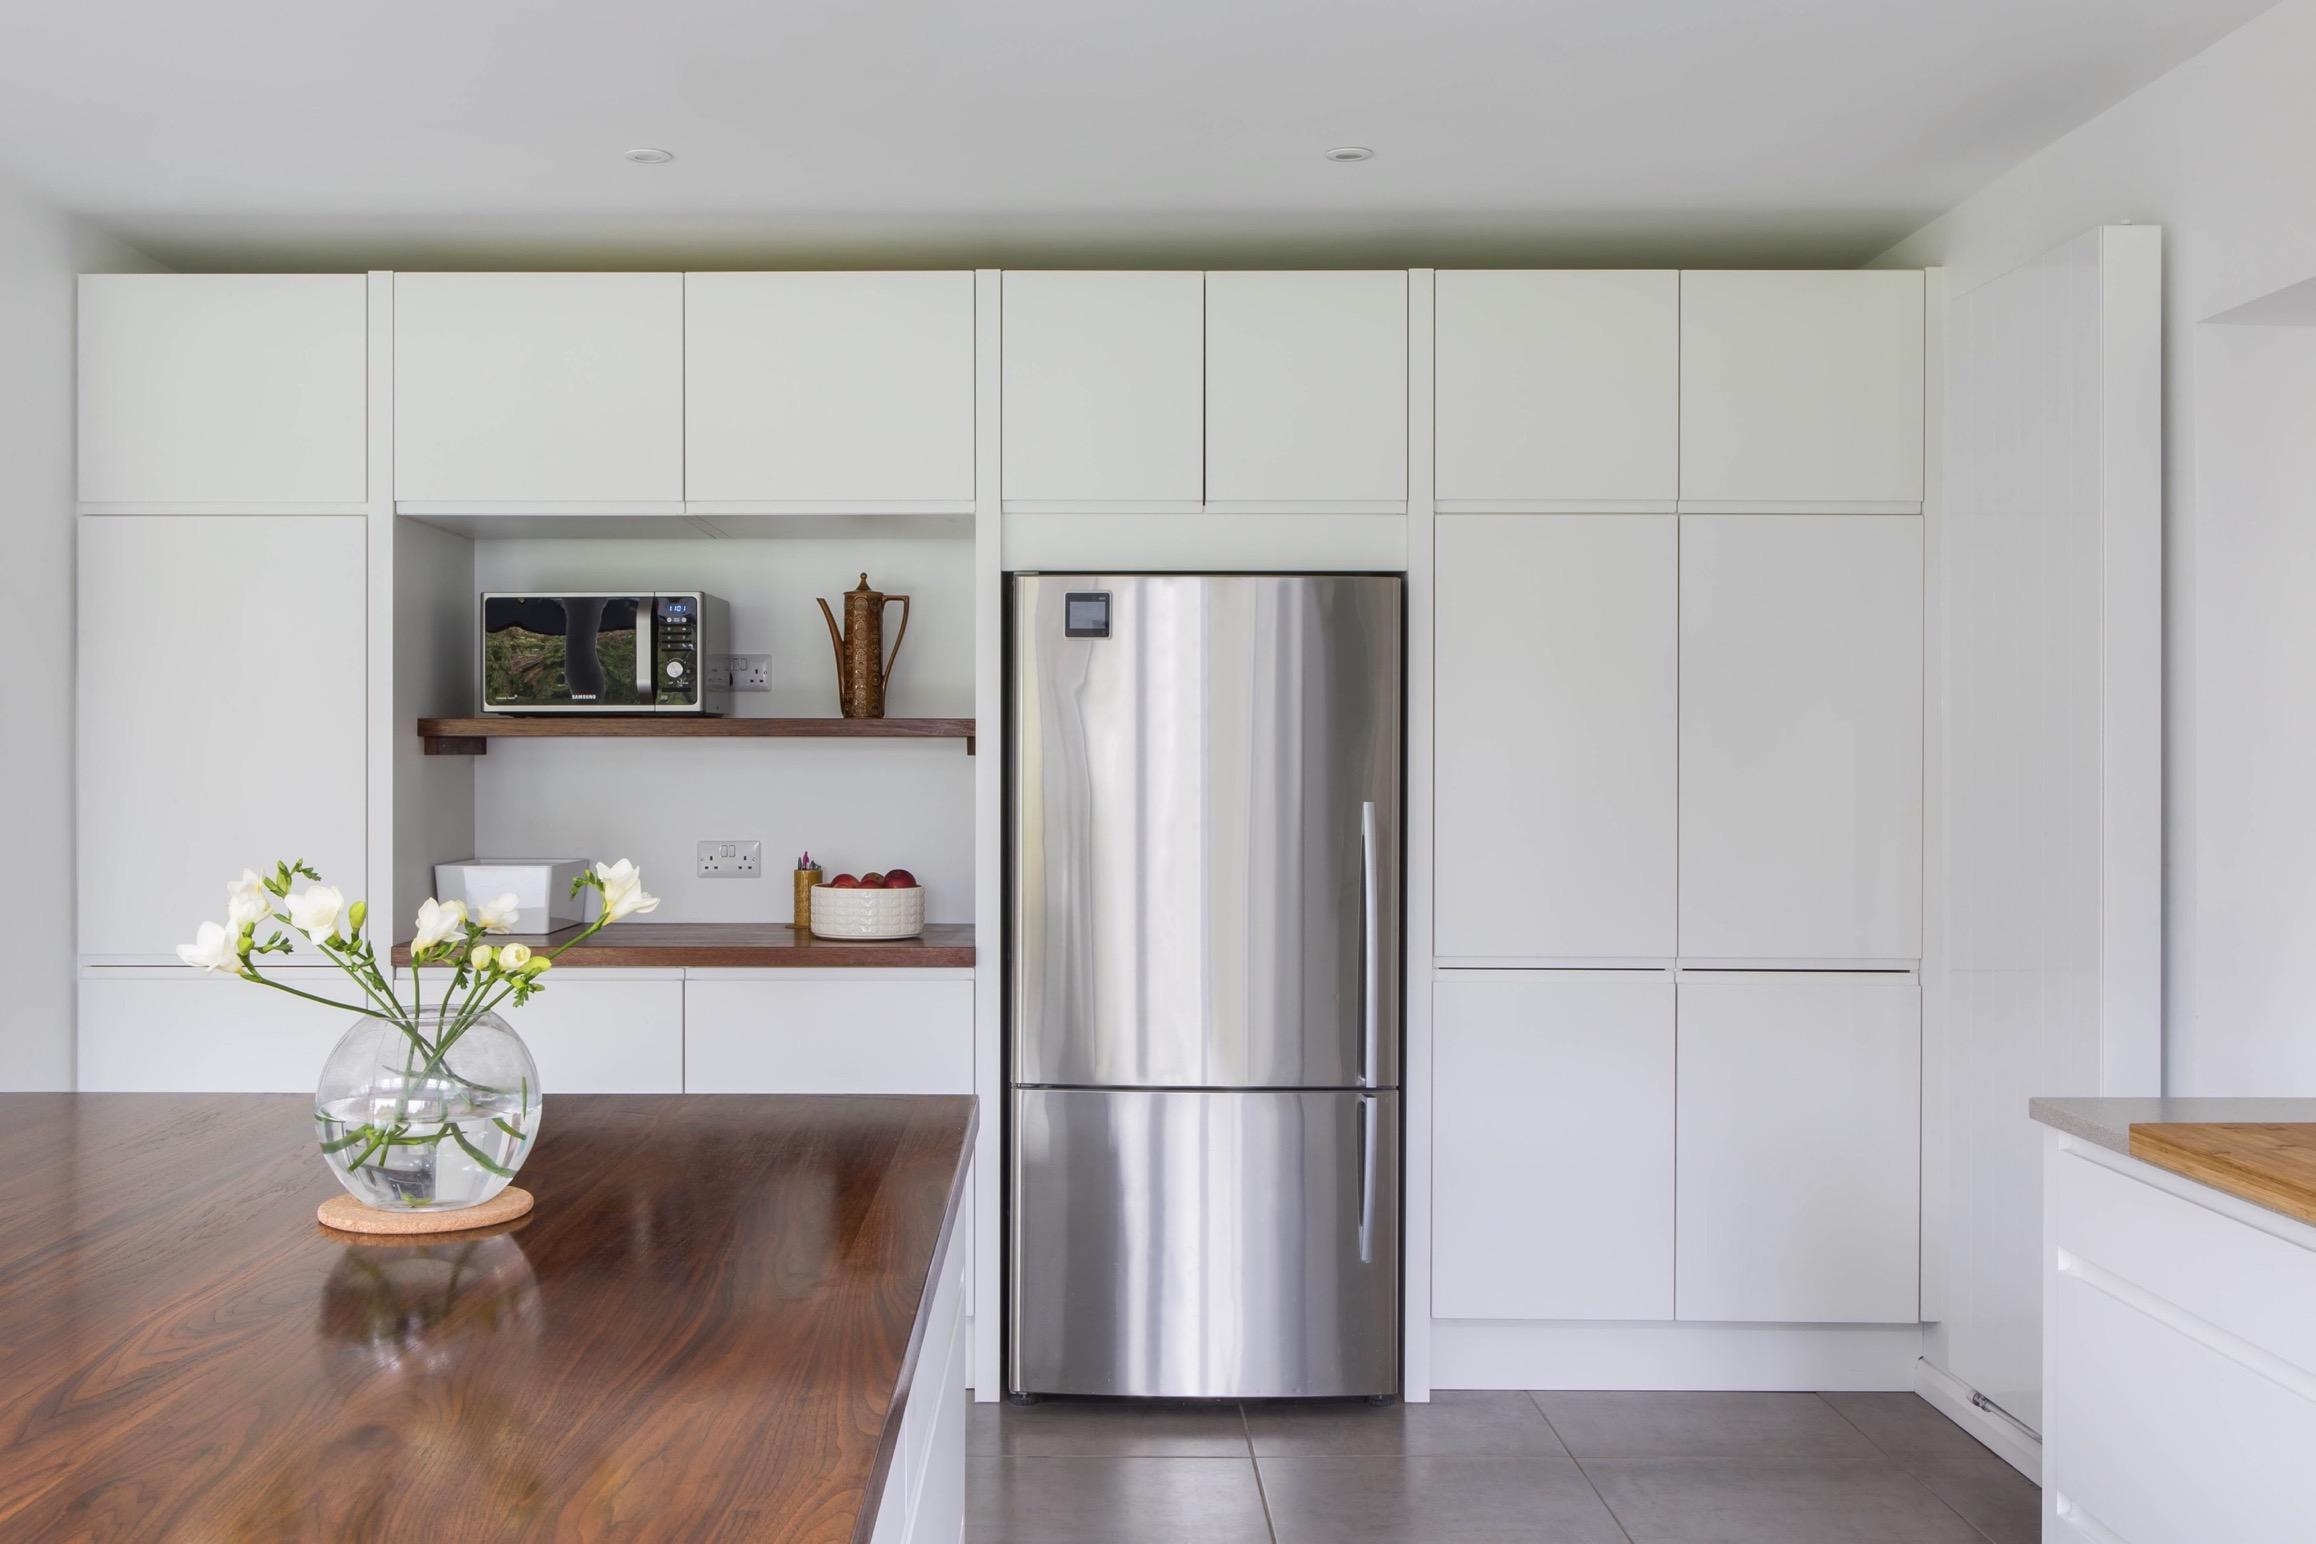 Walnut kitchen island handleless stainless steel fridge aylesbury buckinghamshire 1